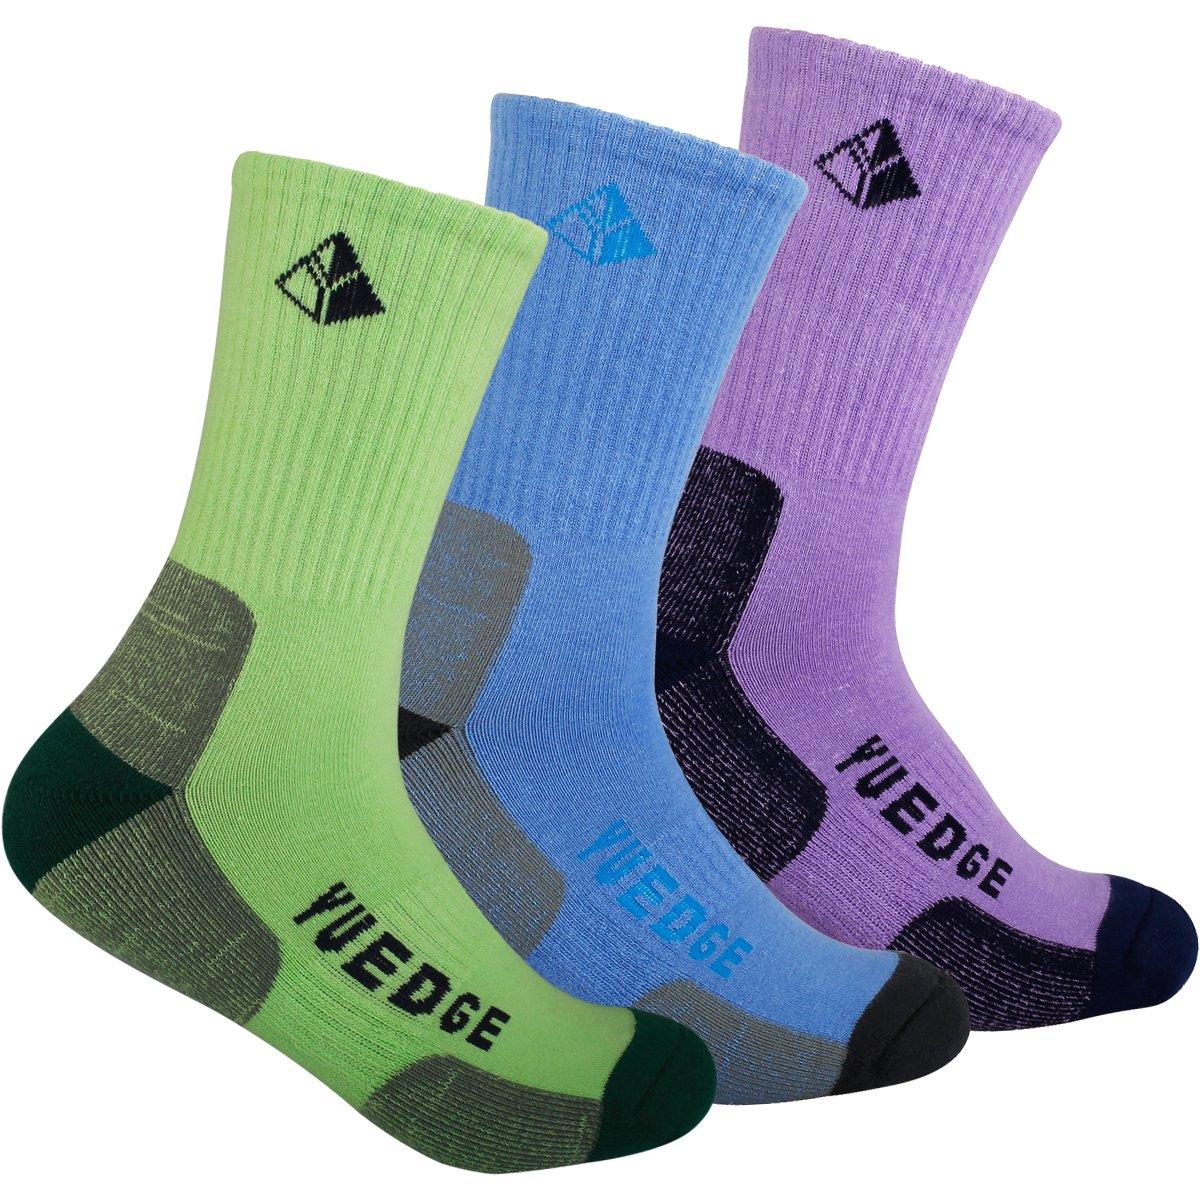 YUEDGE 3 Pairs Women's Wicking Cushion Performance Athletic Hiking Crew Socks (L, Tender green/Blue/Purple)